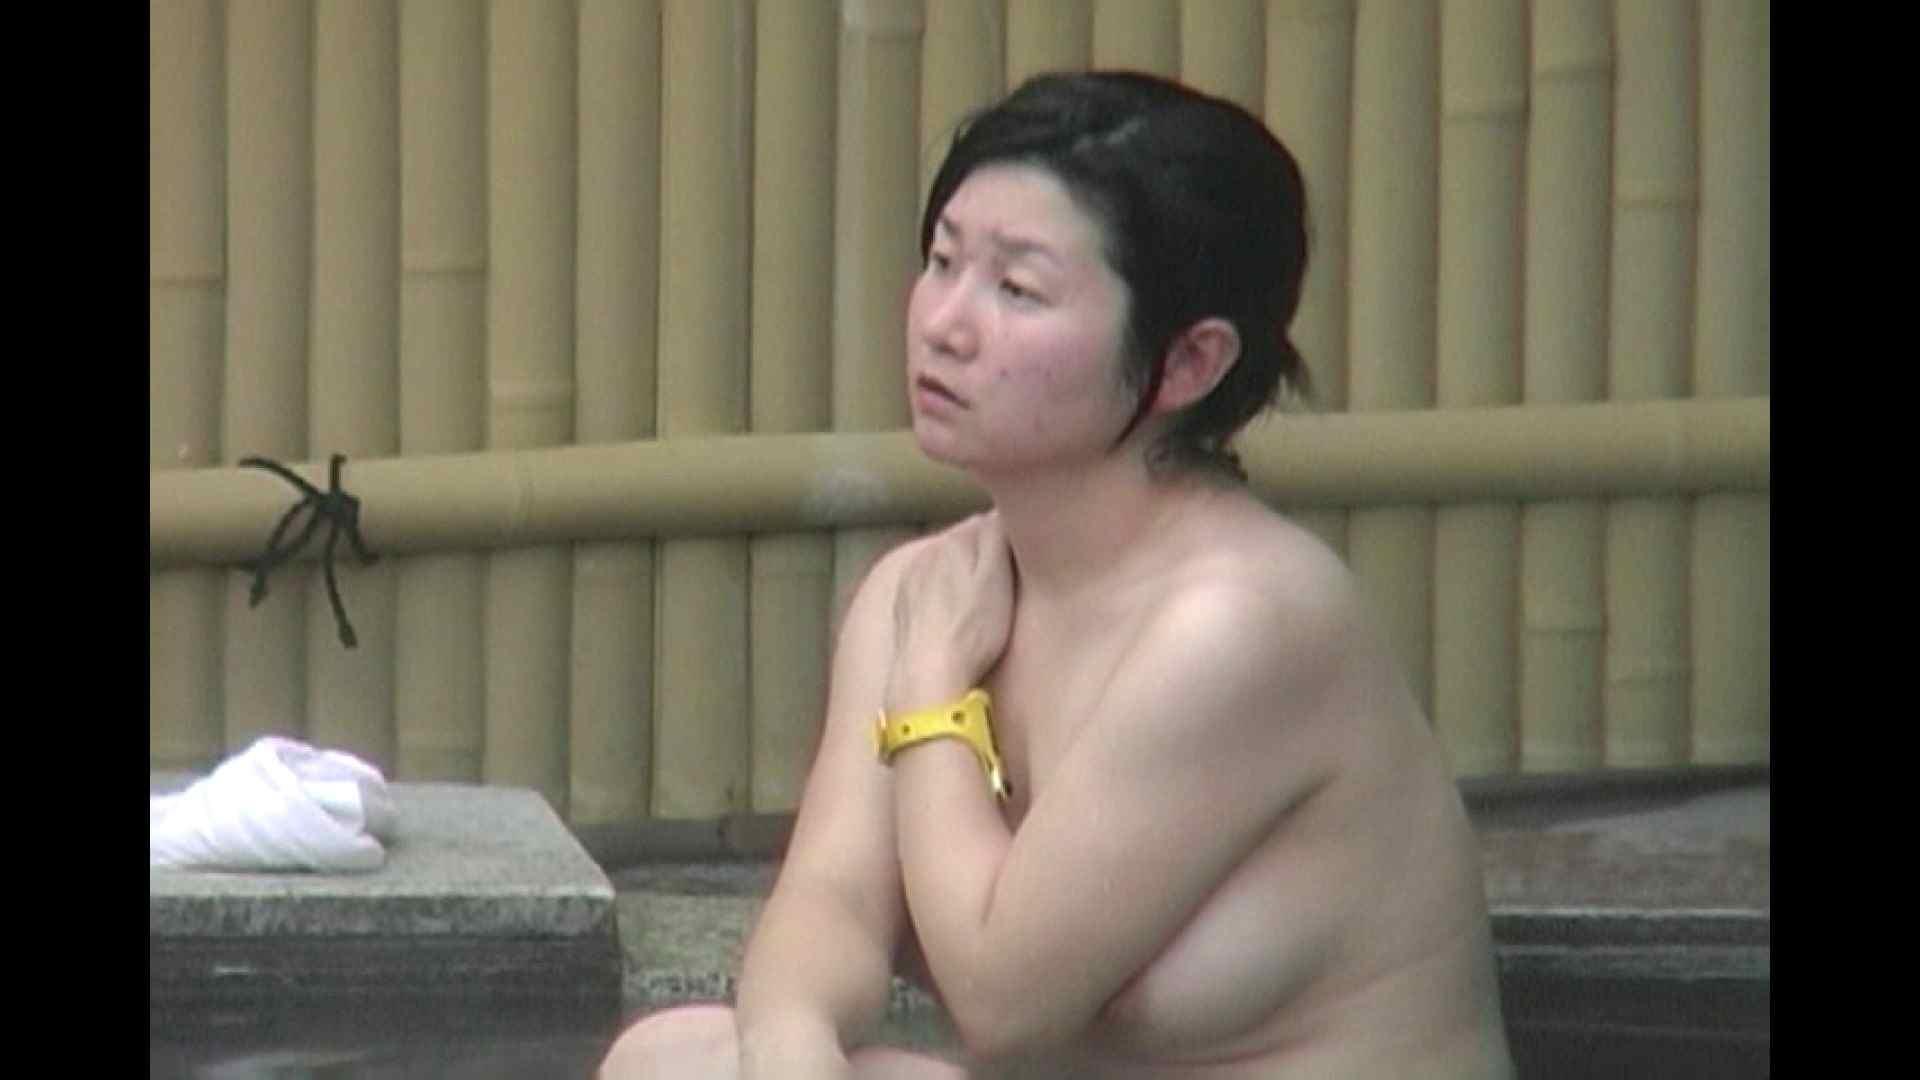 Aquaな露天風呂Vol.545 0 | 0  33連発 6